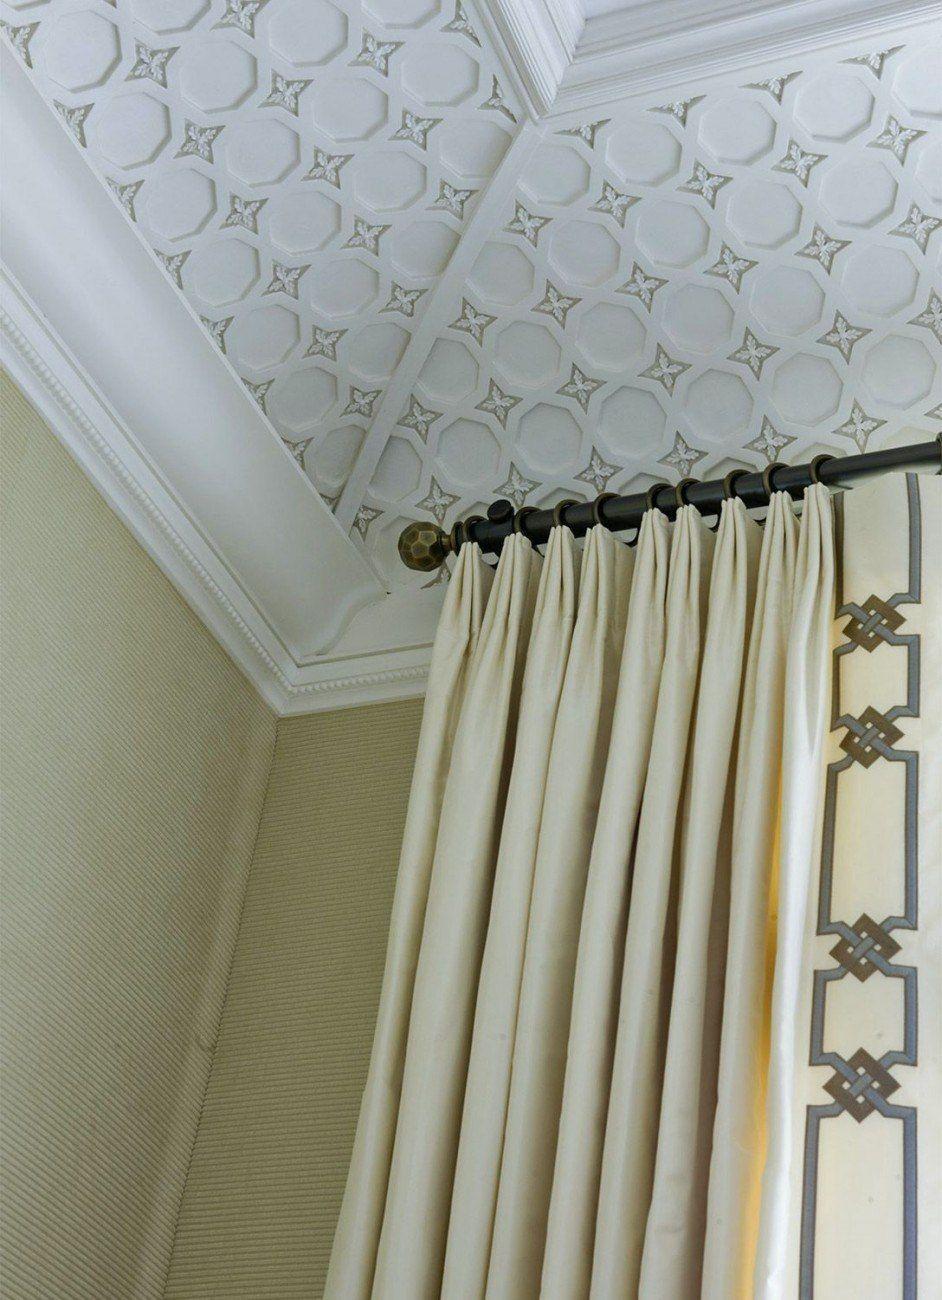 Plaster Ceiling Design + Architectural Mouldings ...